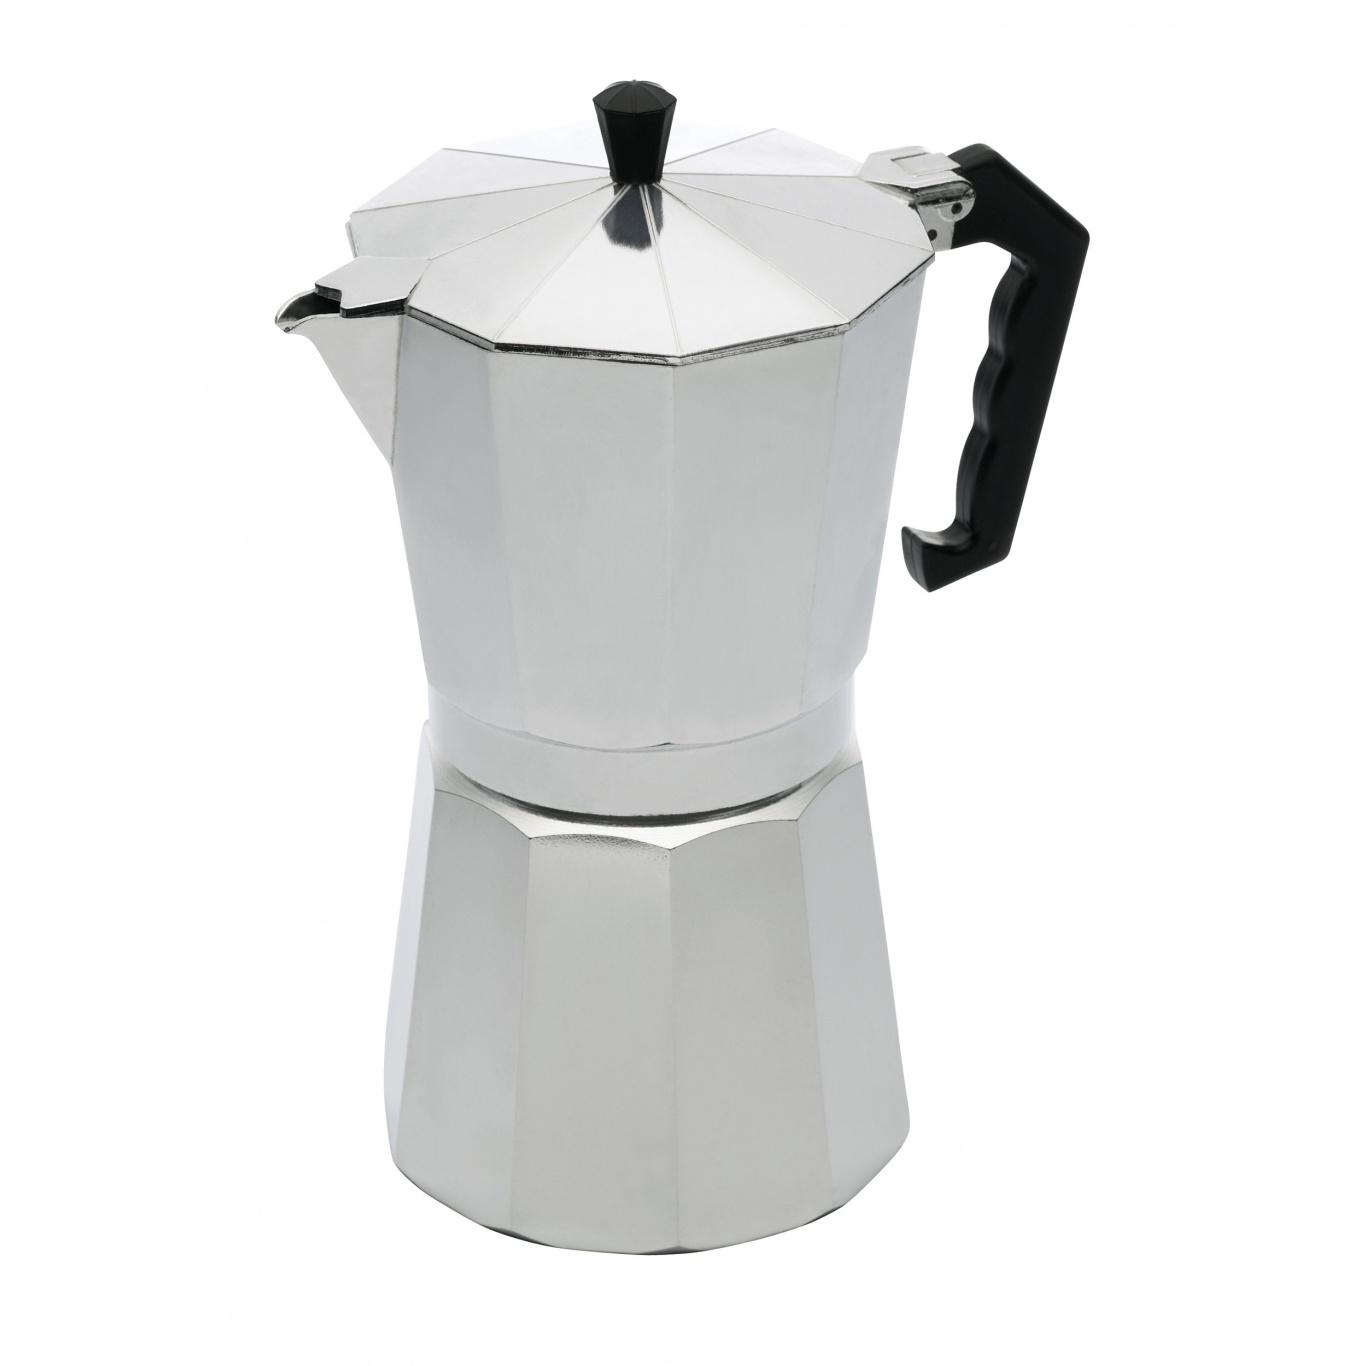 Image of Italian Style 12 Cup Espresso Maker